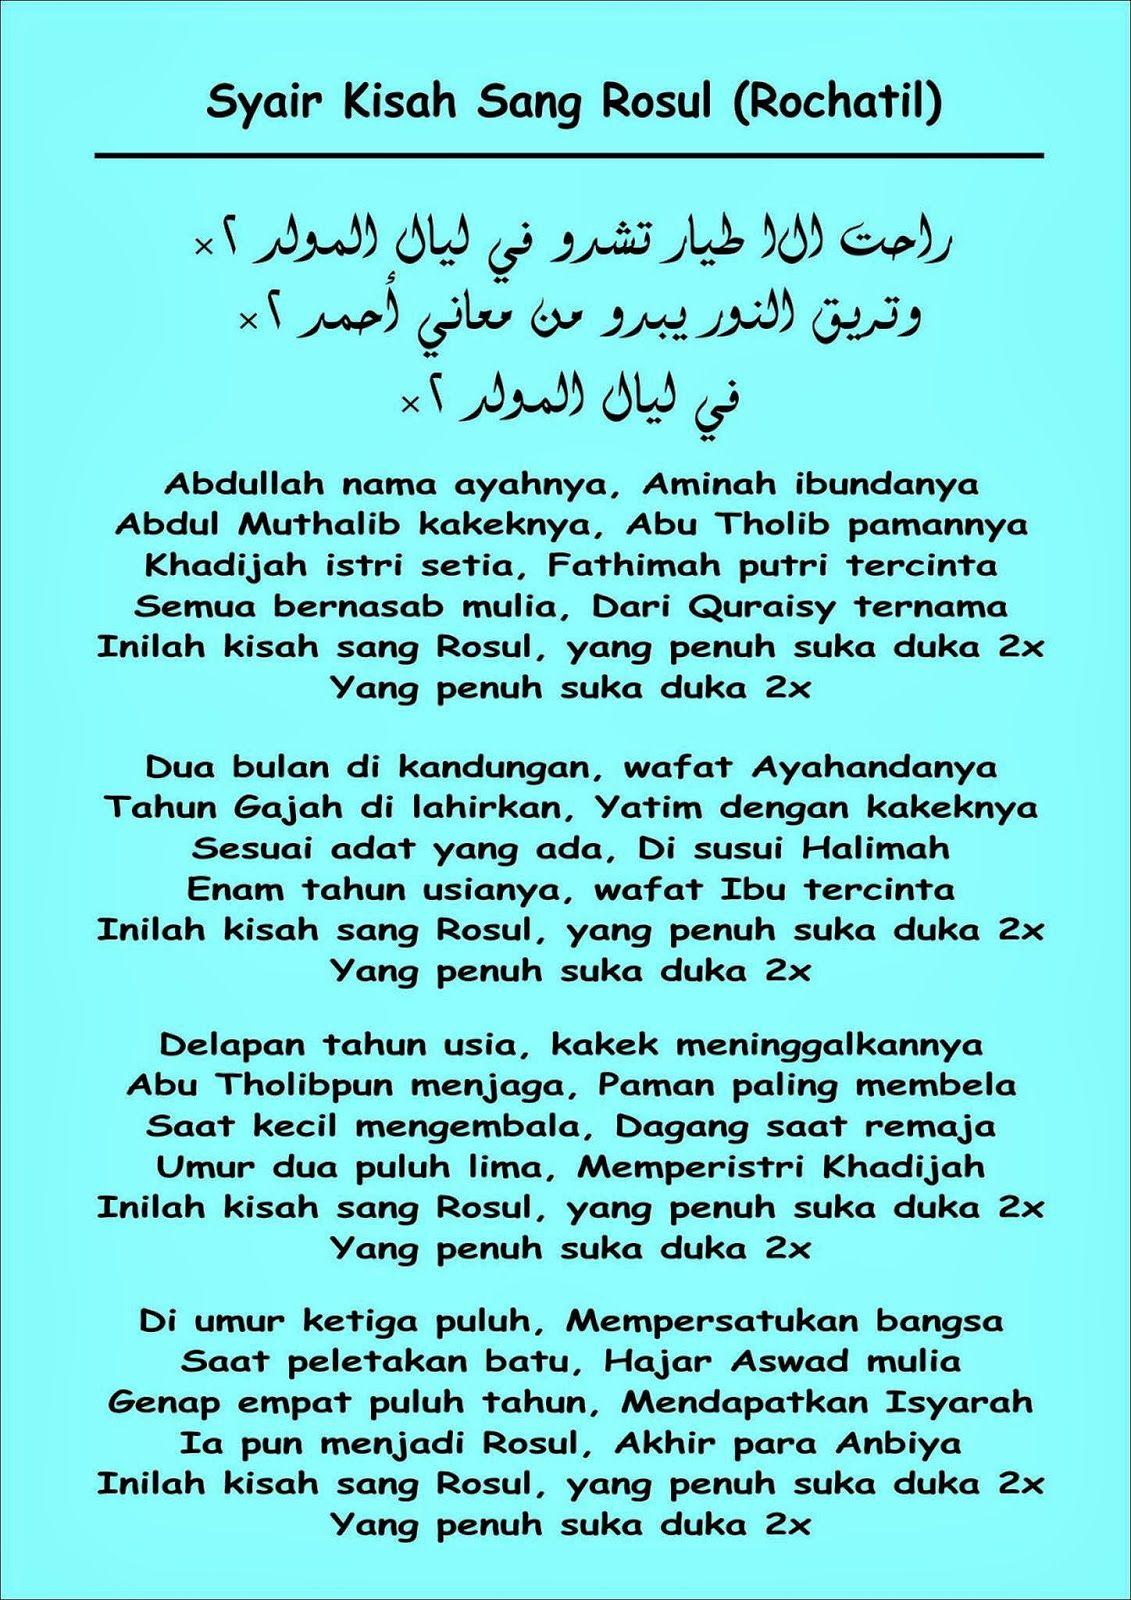 Kisah Sang Rasul Lirik : kisah, rasul, lirik, Lirik, Qasidah, Kisah, Rosul, (Rohatil, Athyaru, Tasydu), Syarifuddin, Official, Lagu,, Lirik,